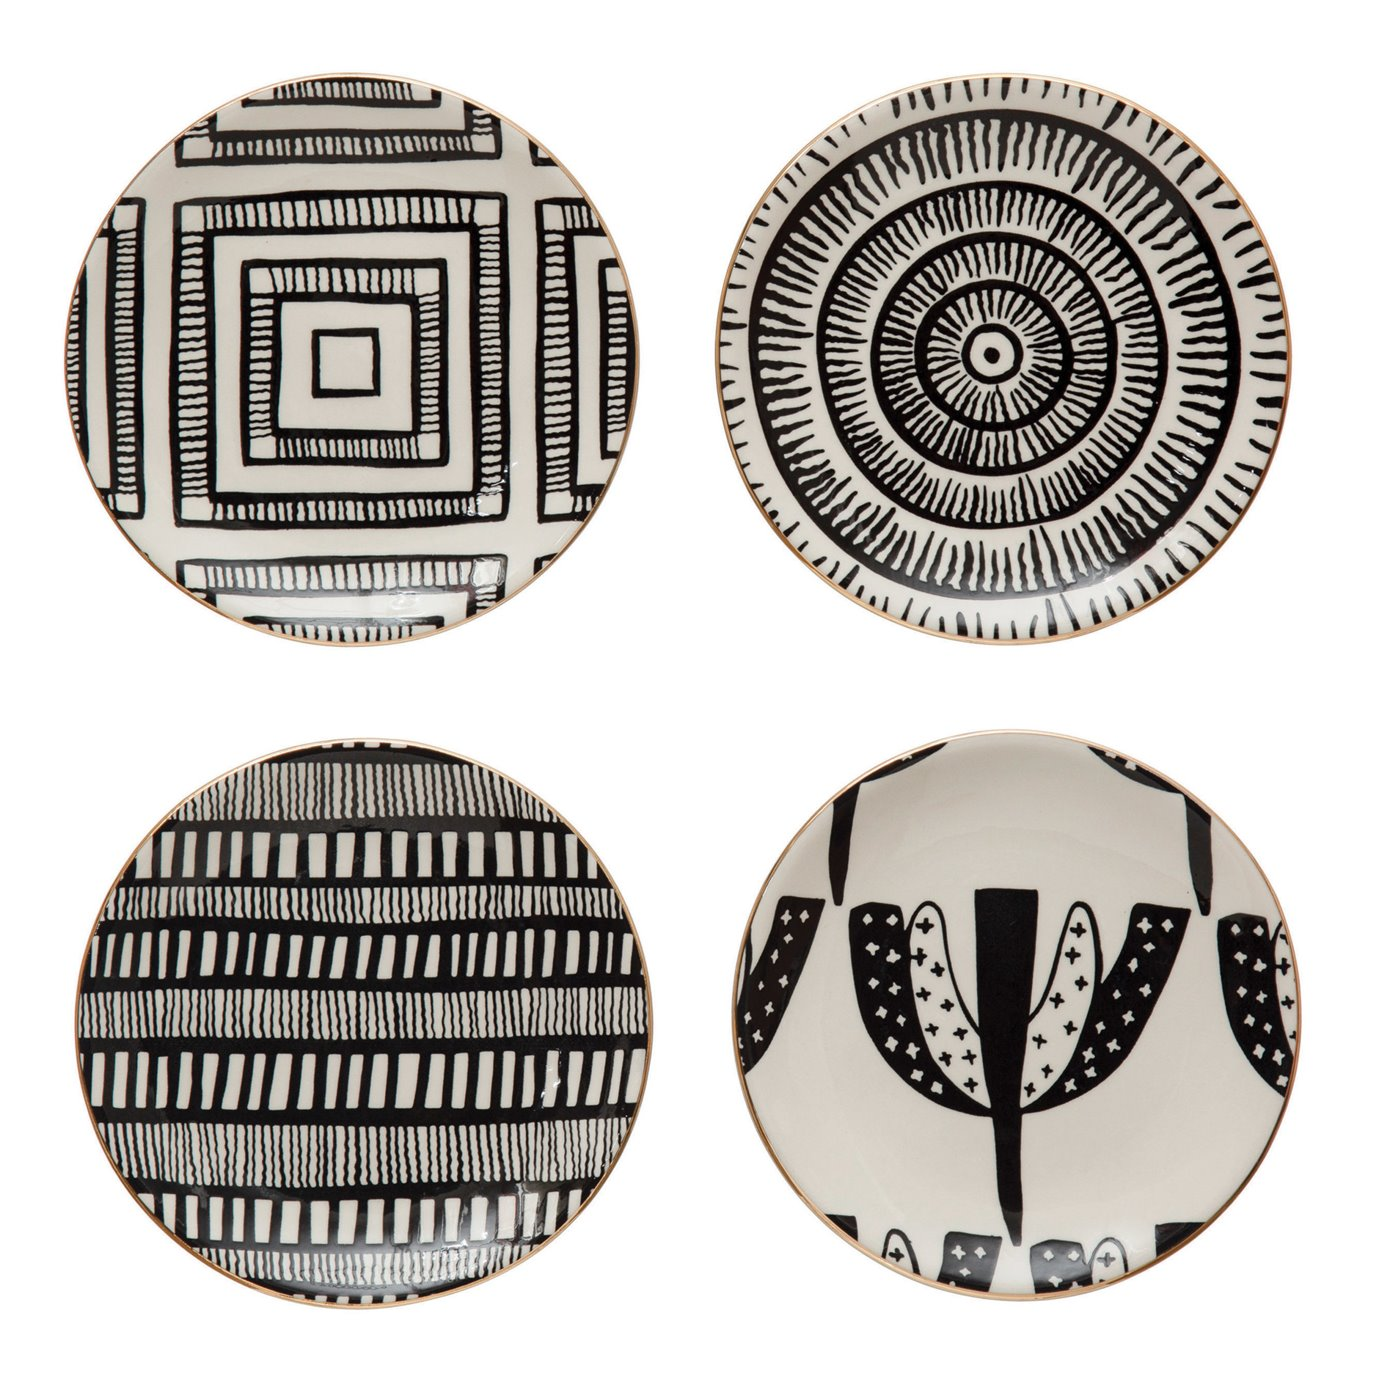 "5-1/2"" Round Stoneware Plate w/ Pattern & Gold Electroplating, Black & White, 4 Styles"